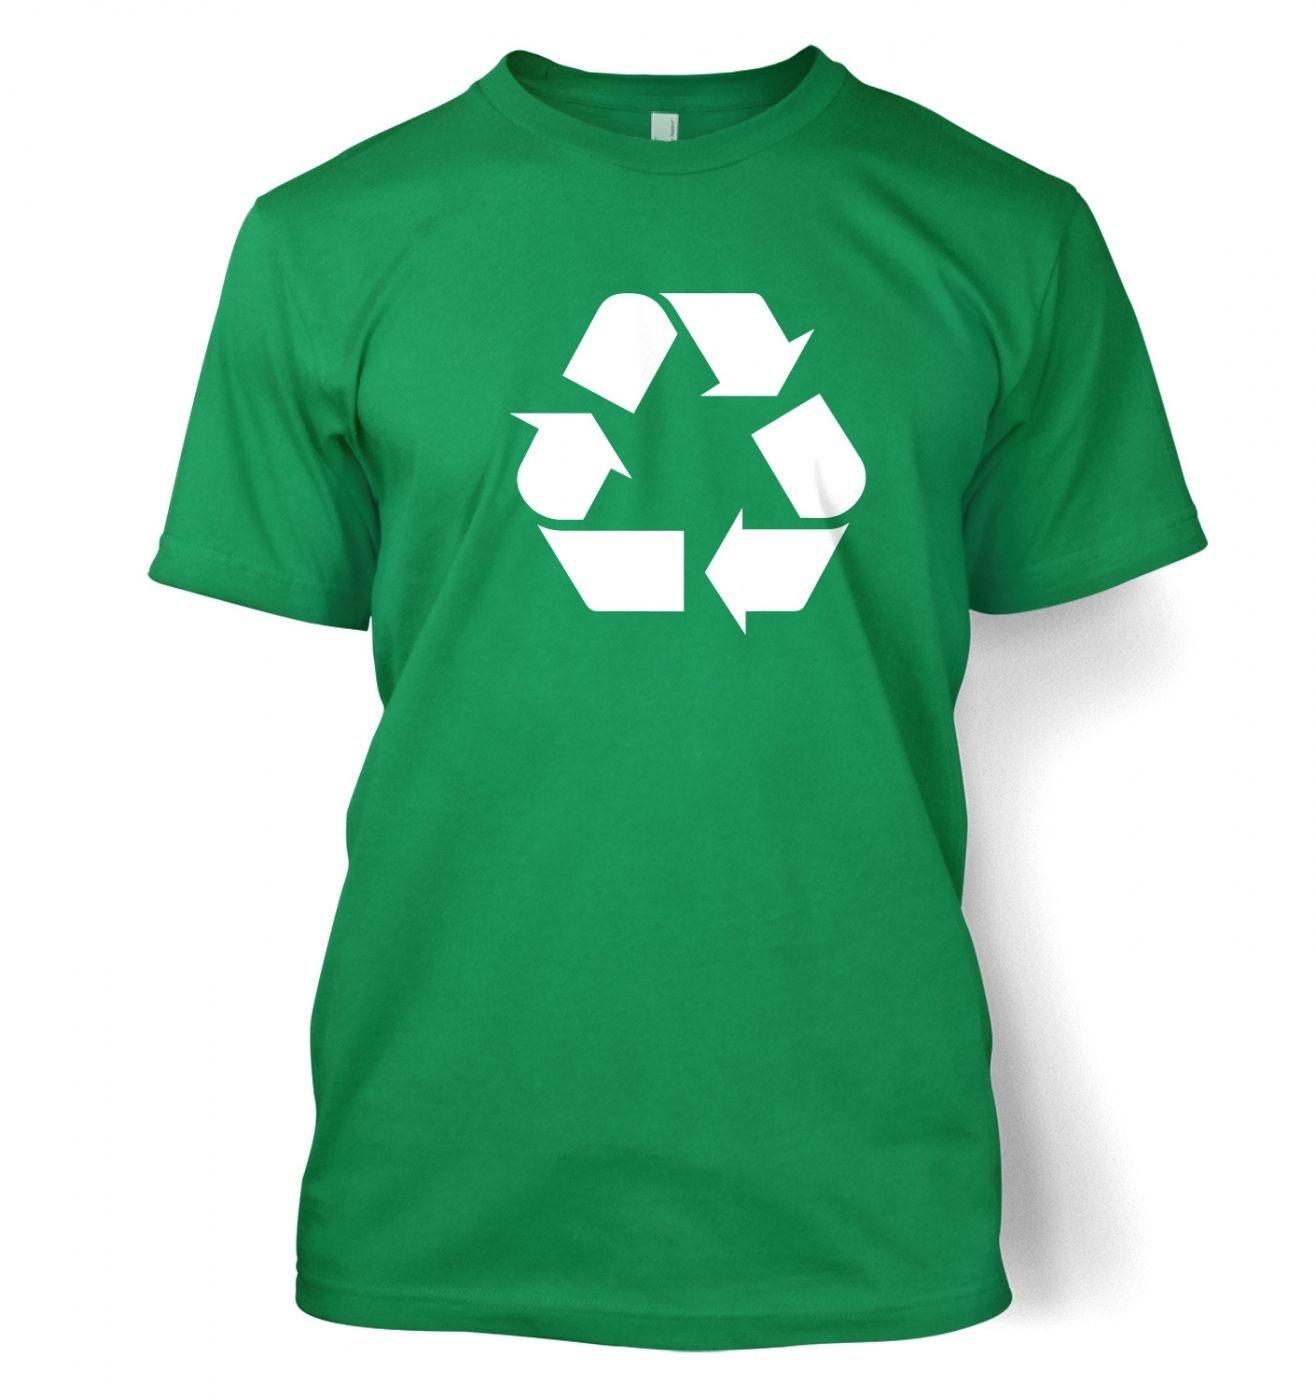 White recycling symbol t shirt somethinggeeky white recycling symbol mens t shirt buycottarizona